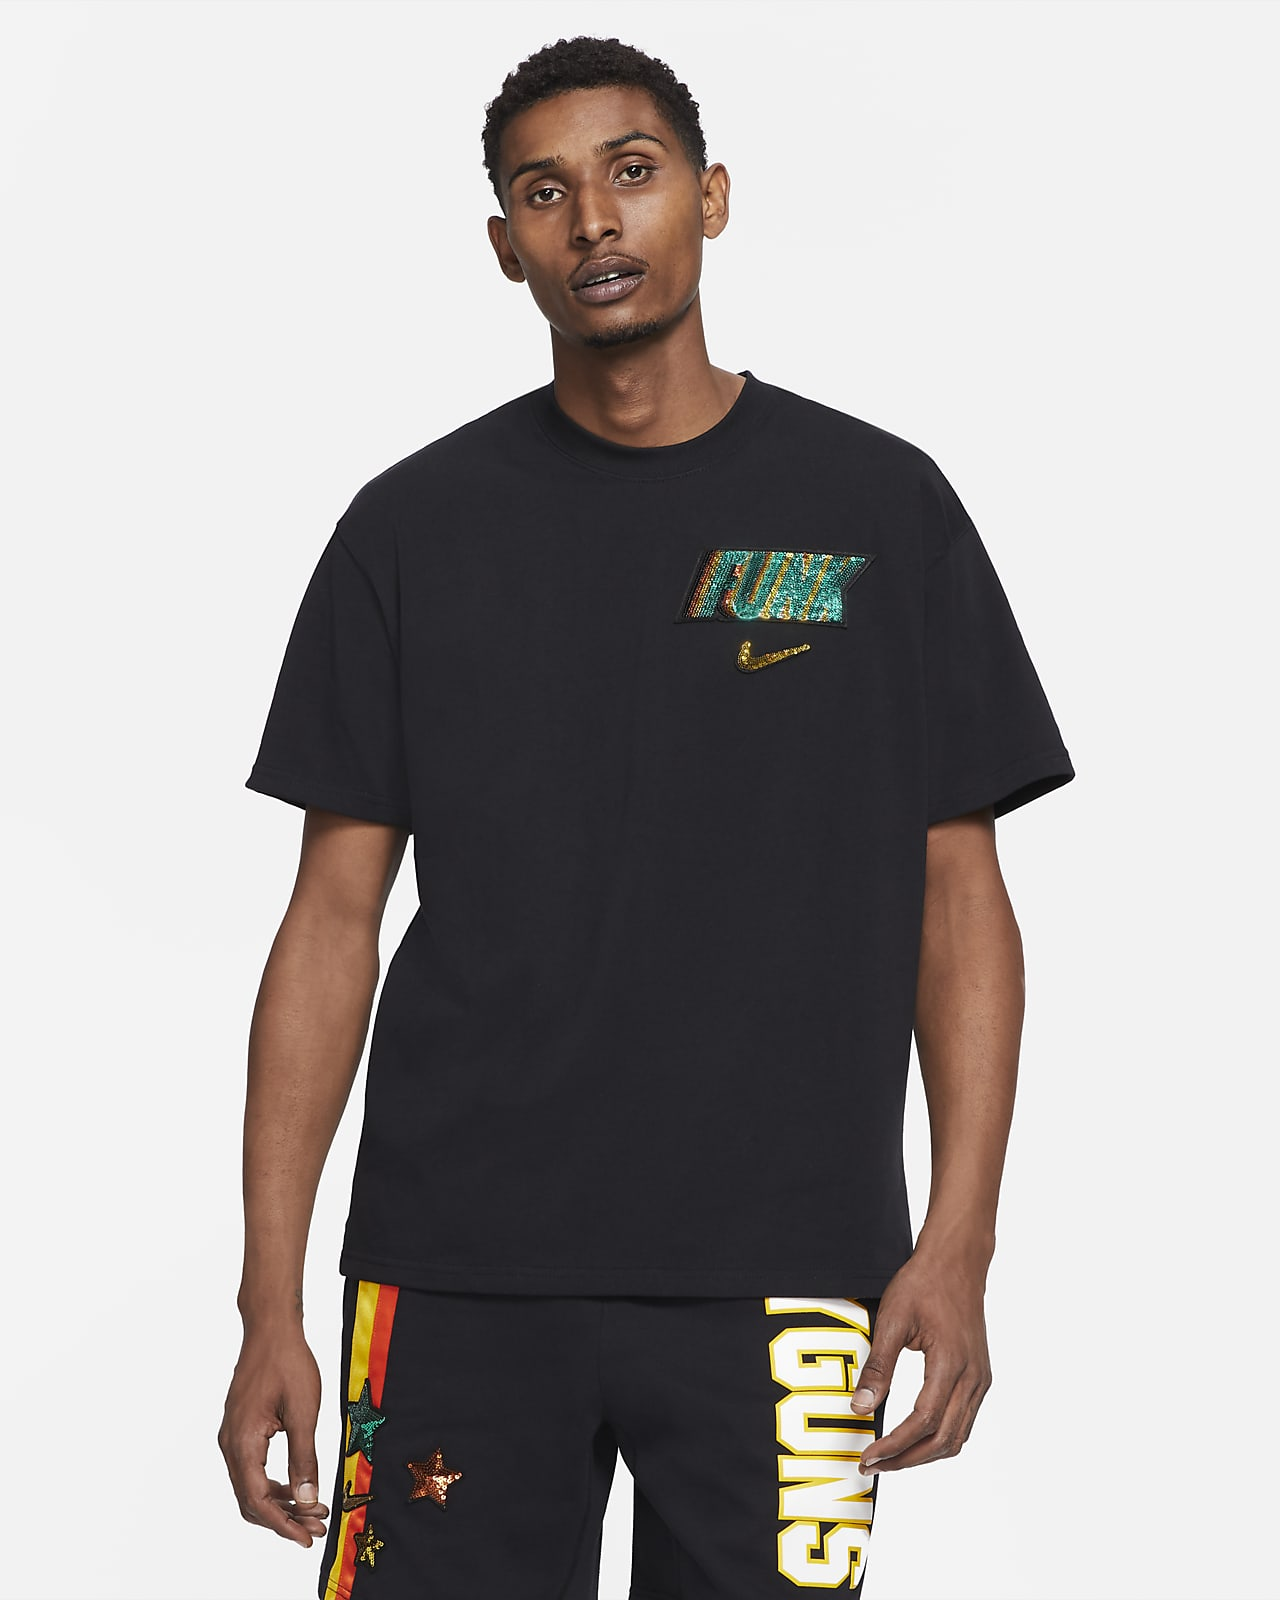 Tee-shirt de basketball Nike Rayguns pour Homme